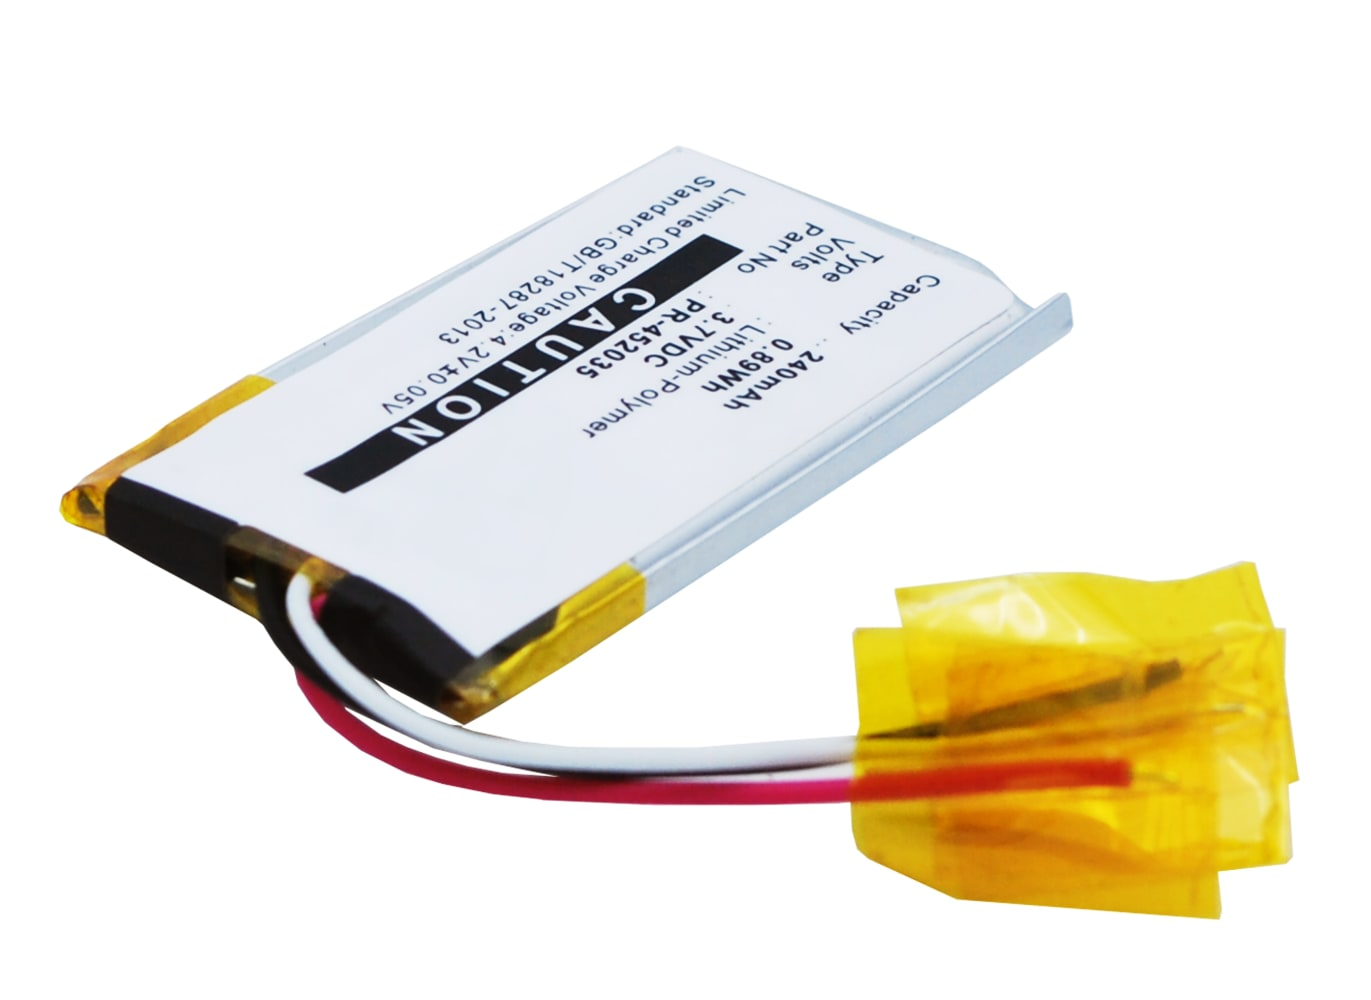 Headset Akku für Bose Quiet Comfort 20 / Bose QC 20 - PR-452035 240mAh , Kopfhörer Ersatzakku Batterie